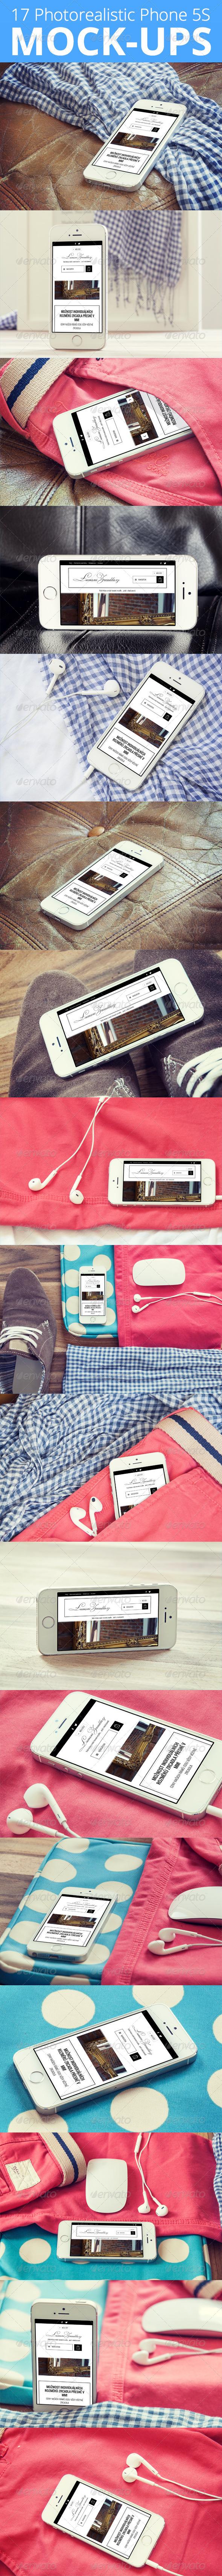 17 Photorealistic Phone 5S Mock-Ups Set